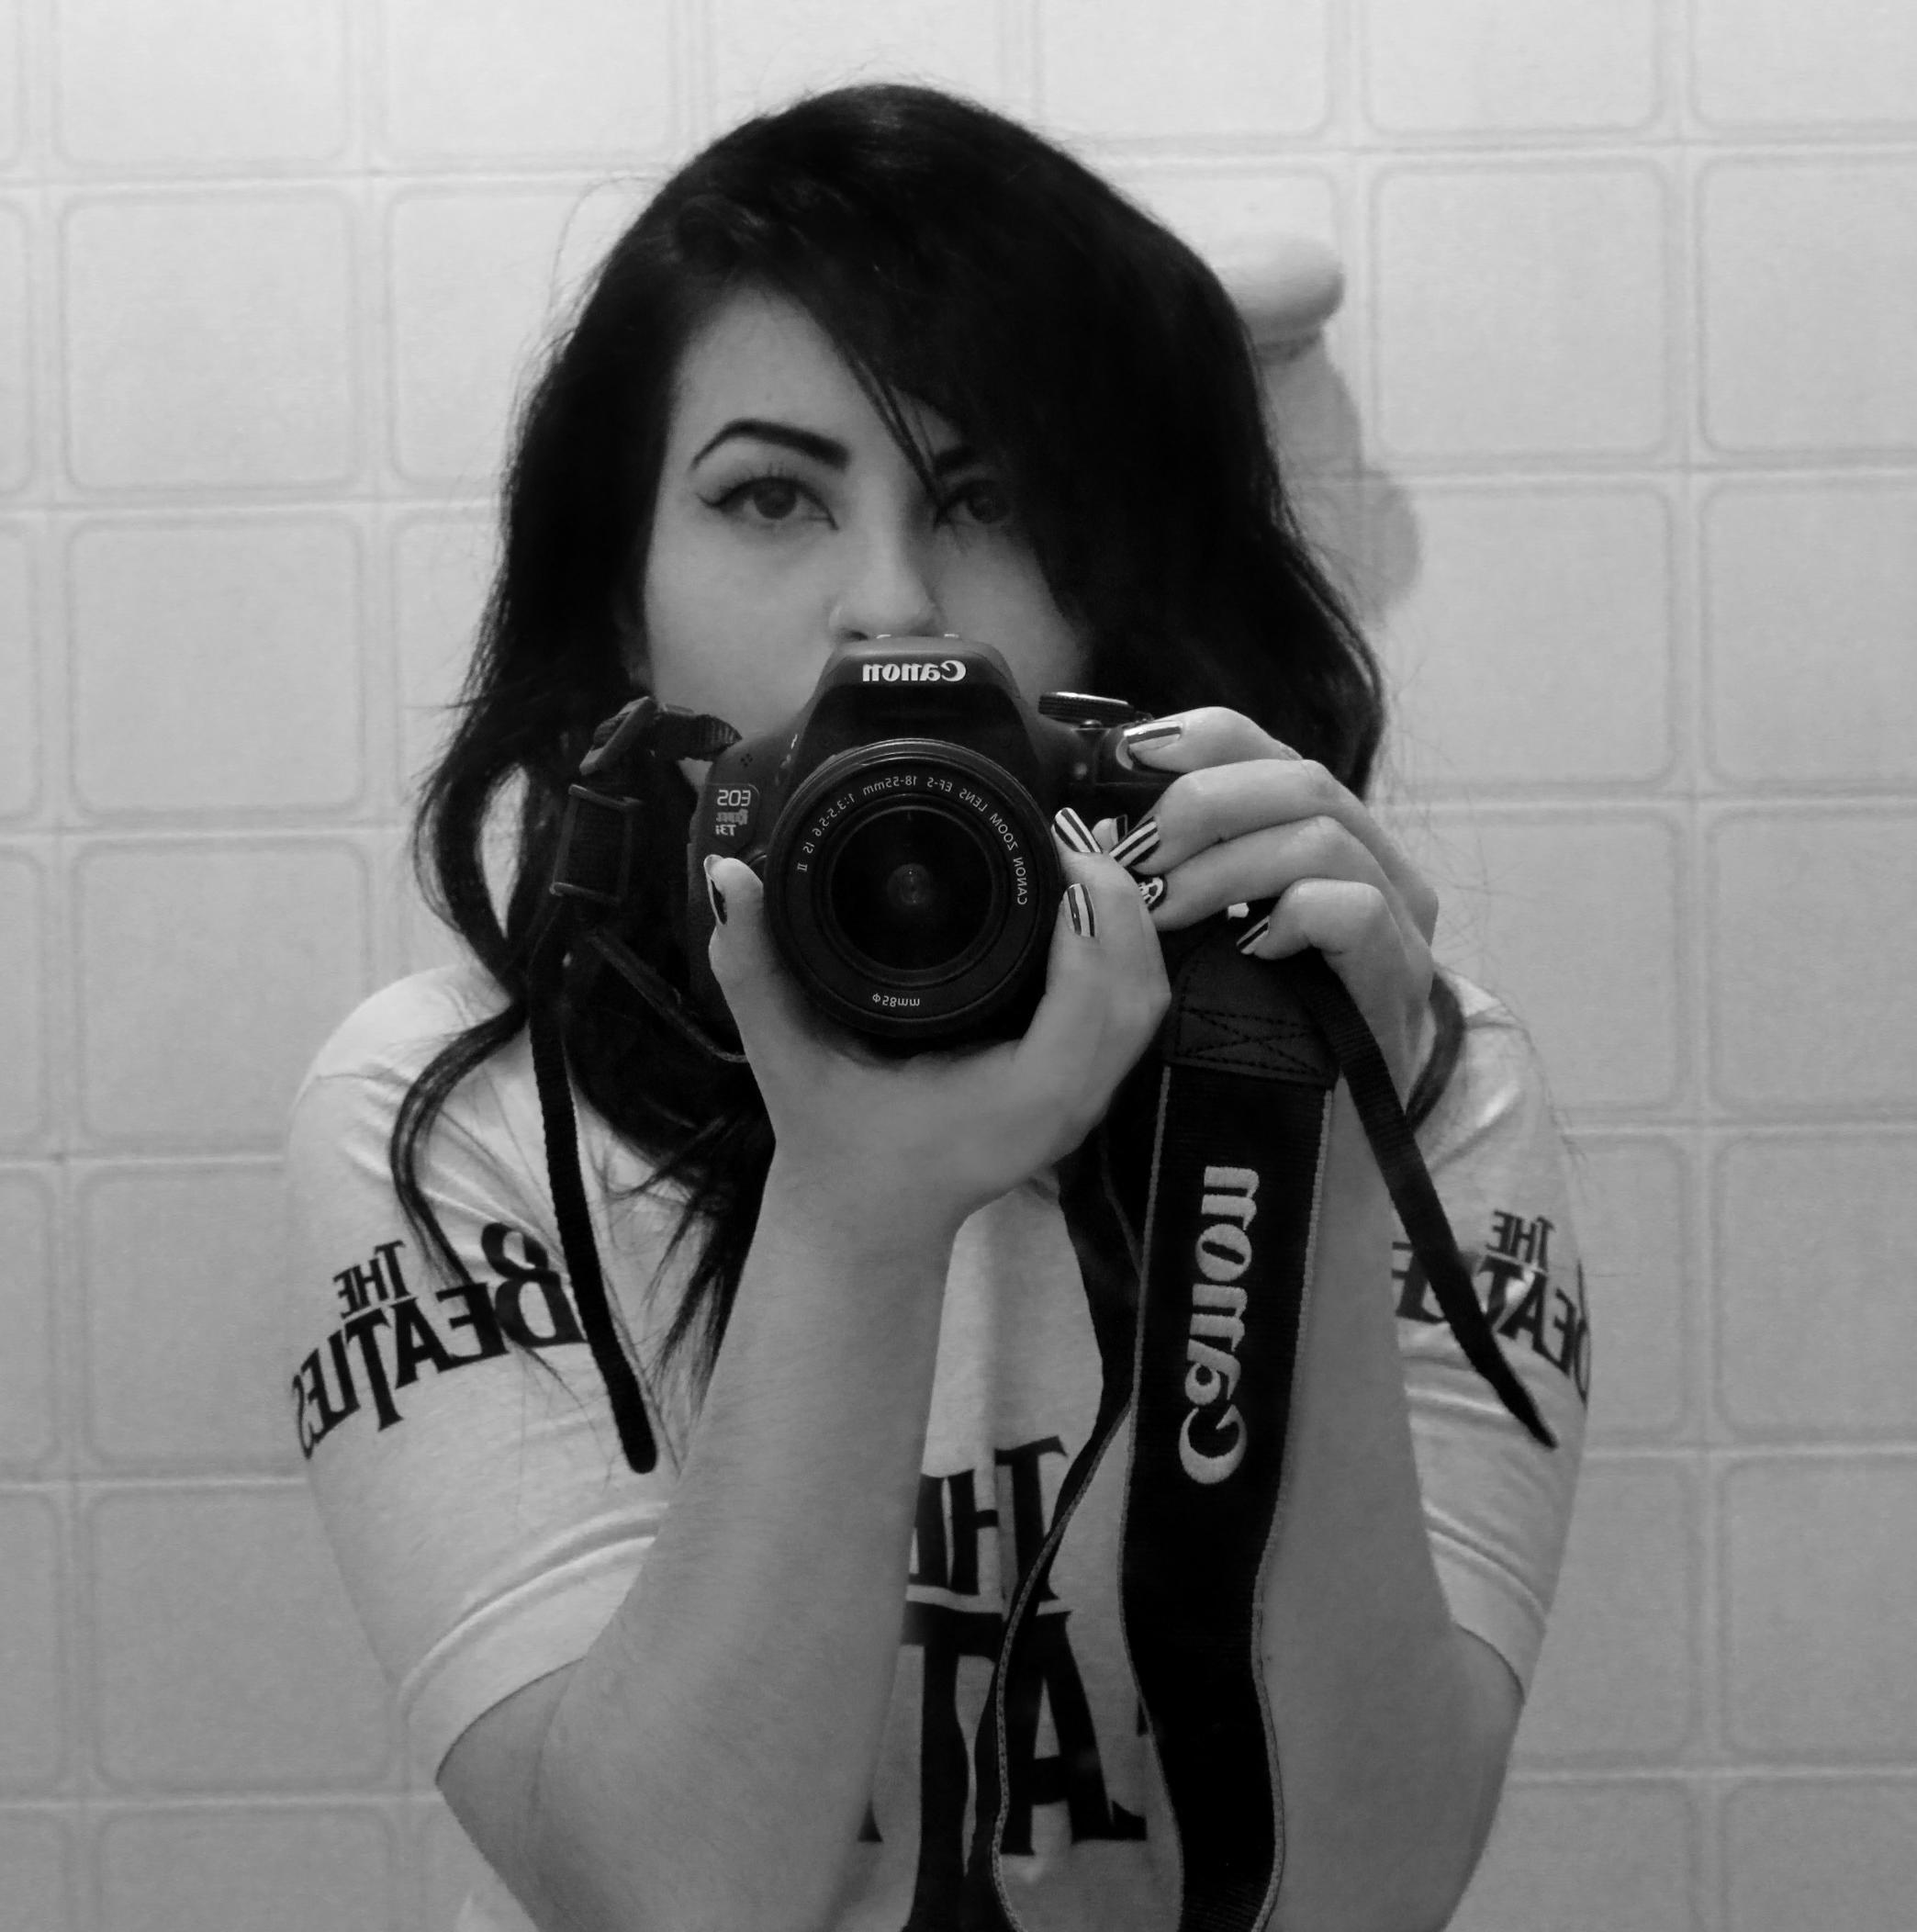 models id Victoria Blaze.